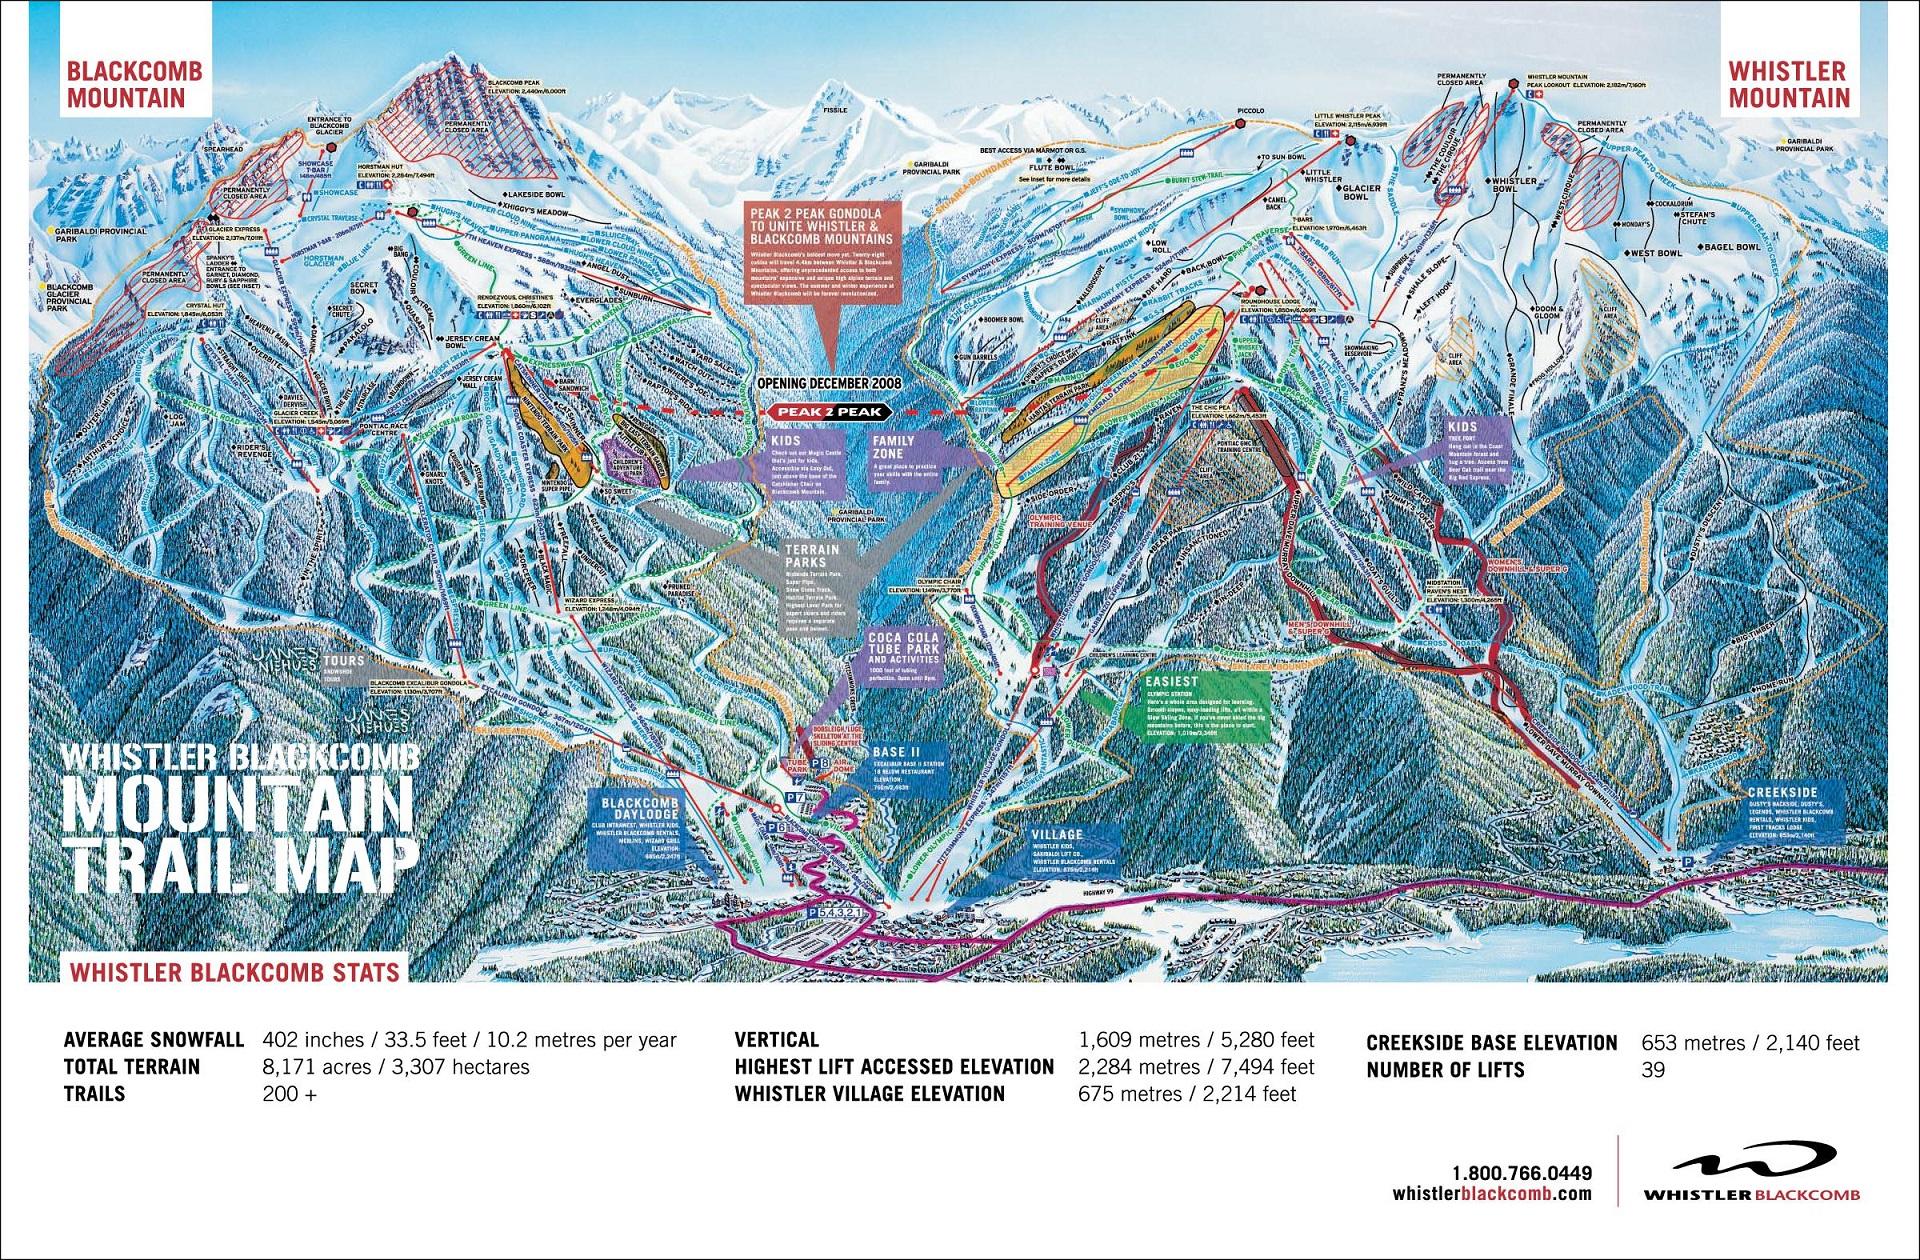 Domaine skiable de Whistler Blackcomb